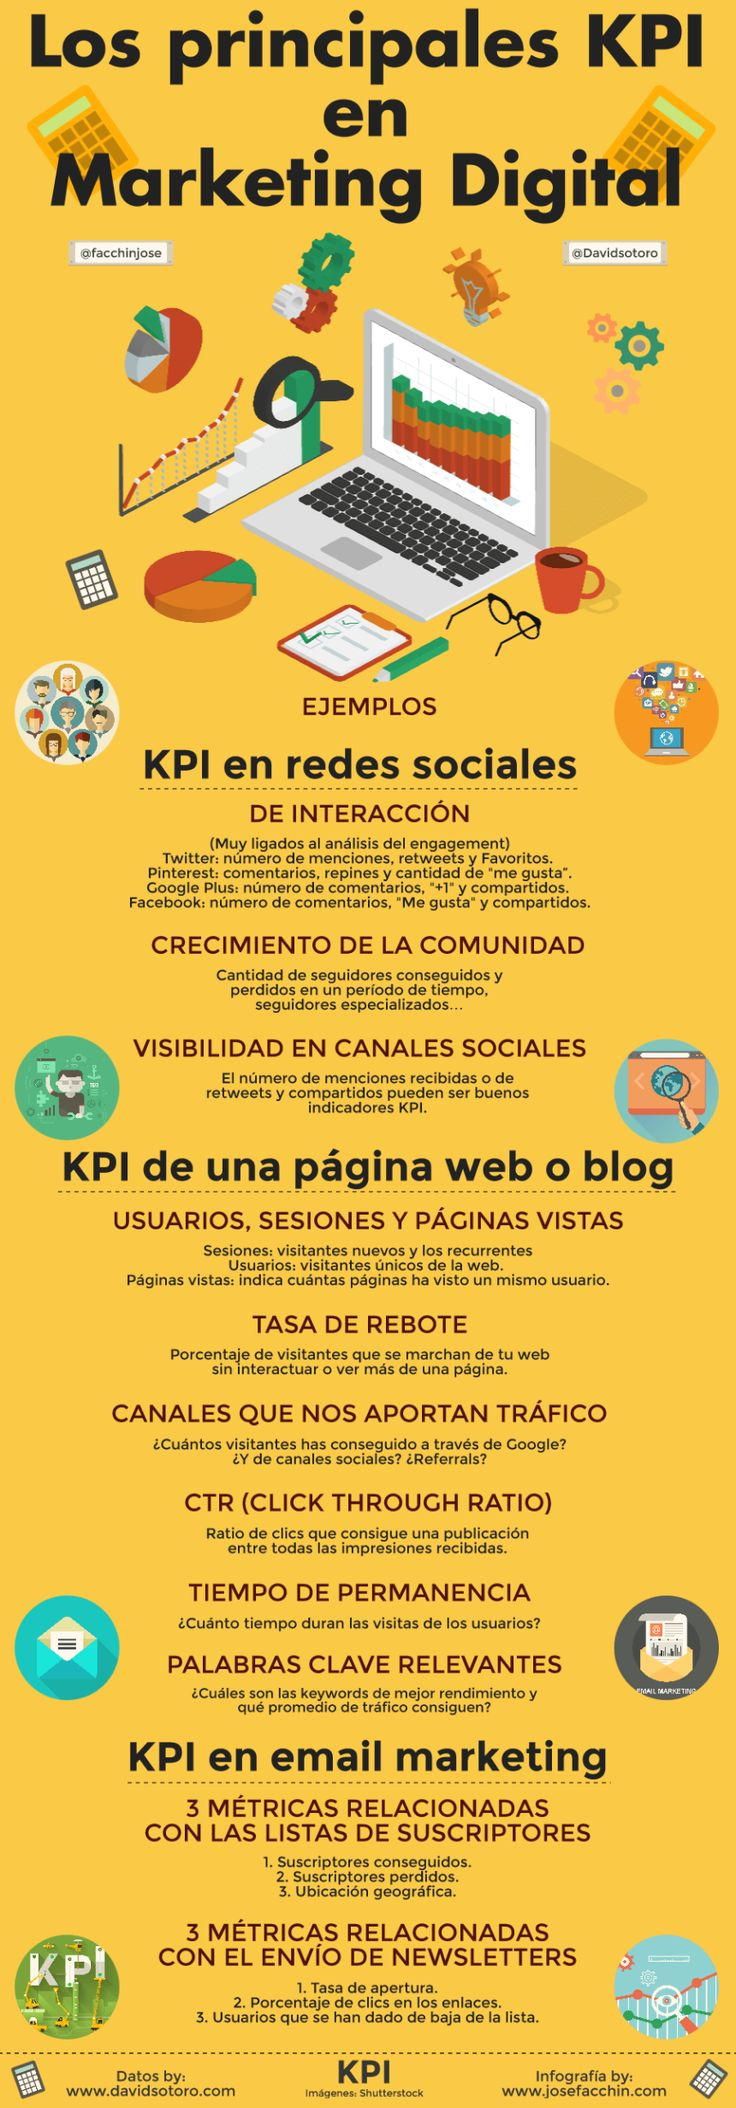 Los principales KPI del marketing digital #infografia #infographic #marketing